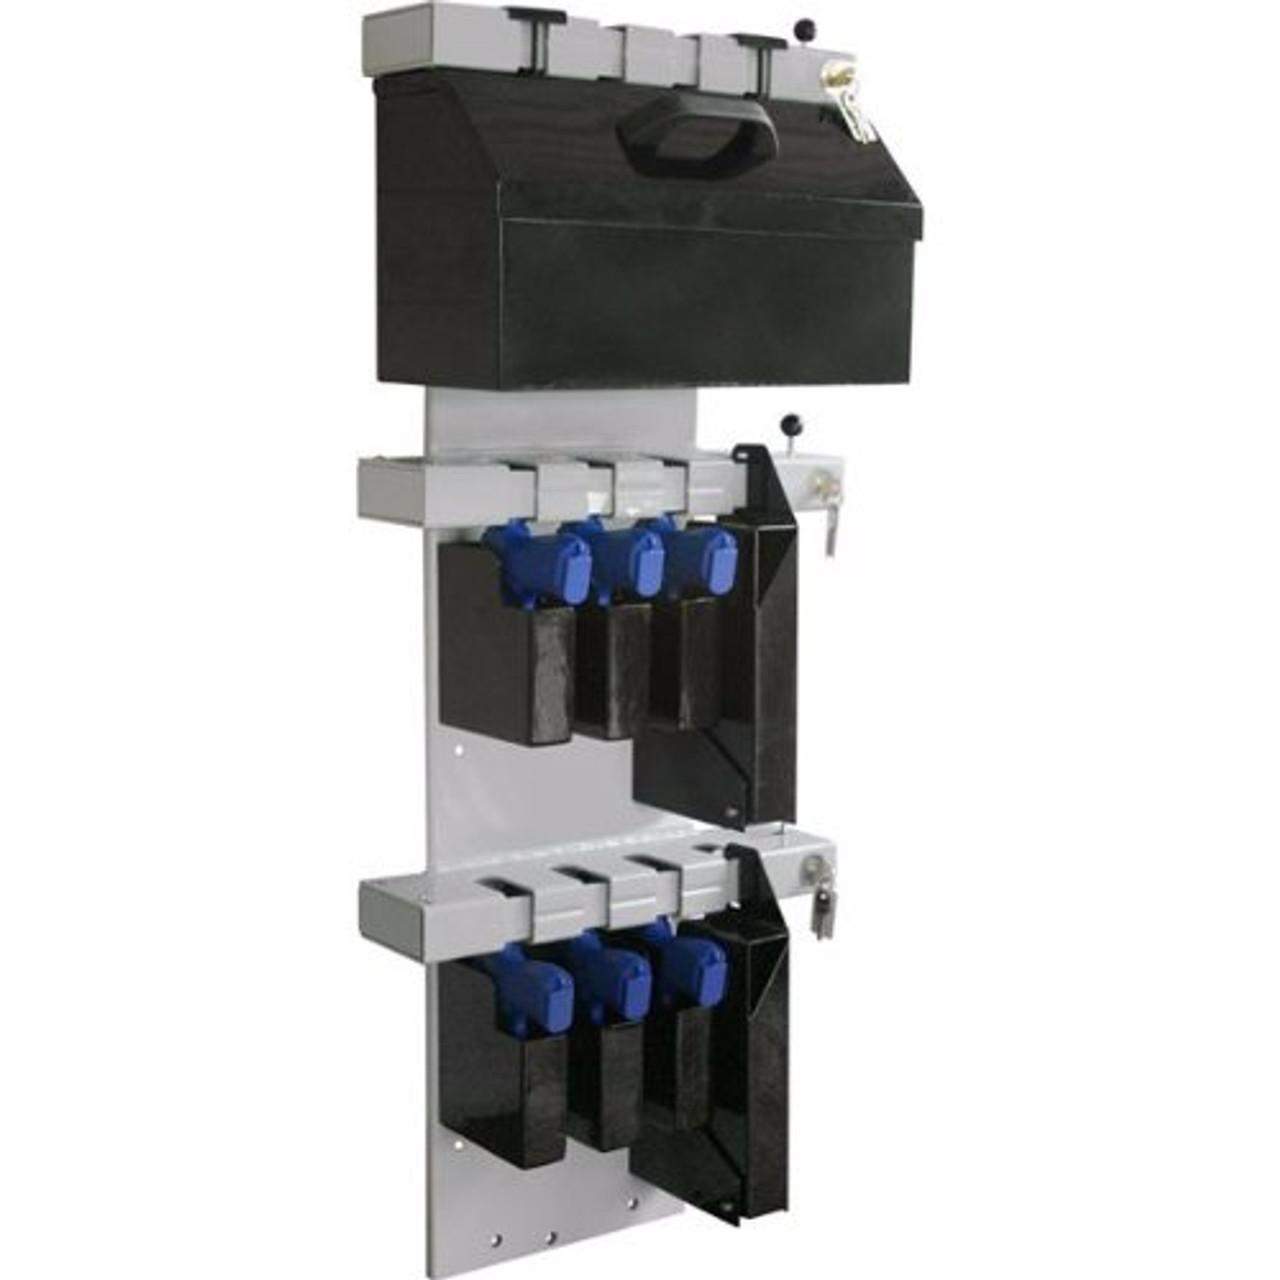 tufloc 72 210 12 slot handgun storage gun rack vertical wall mount 47x19x5 power coated steel additional storage box pockets small box holds 2